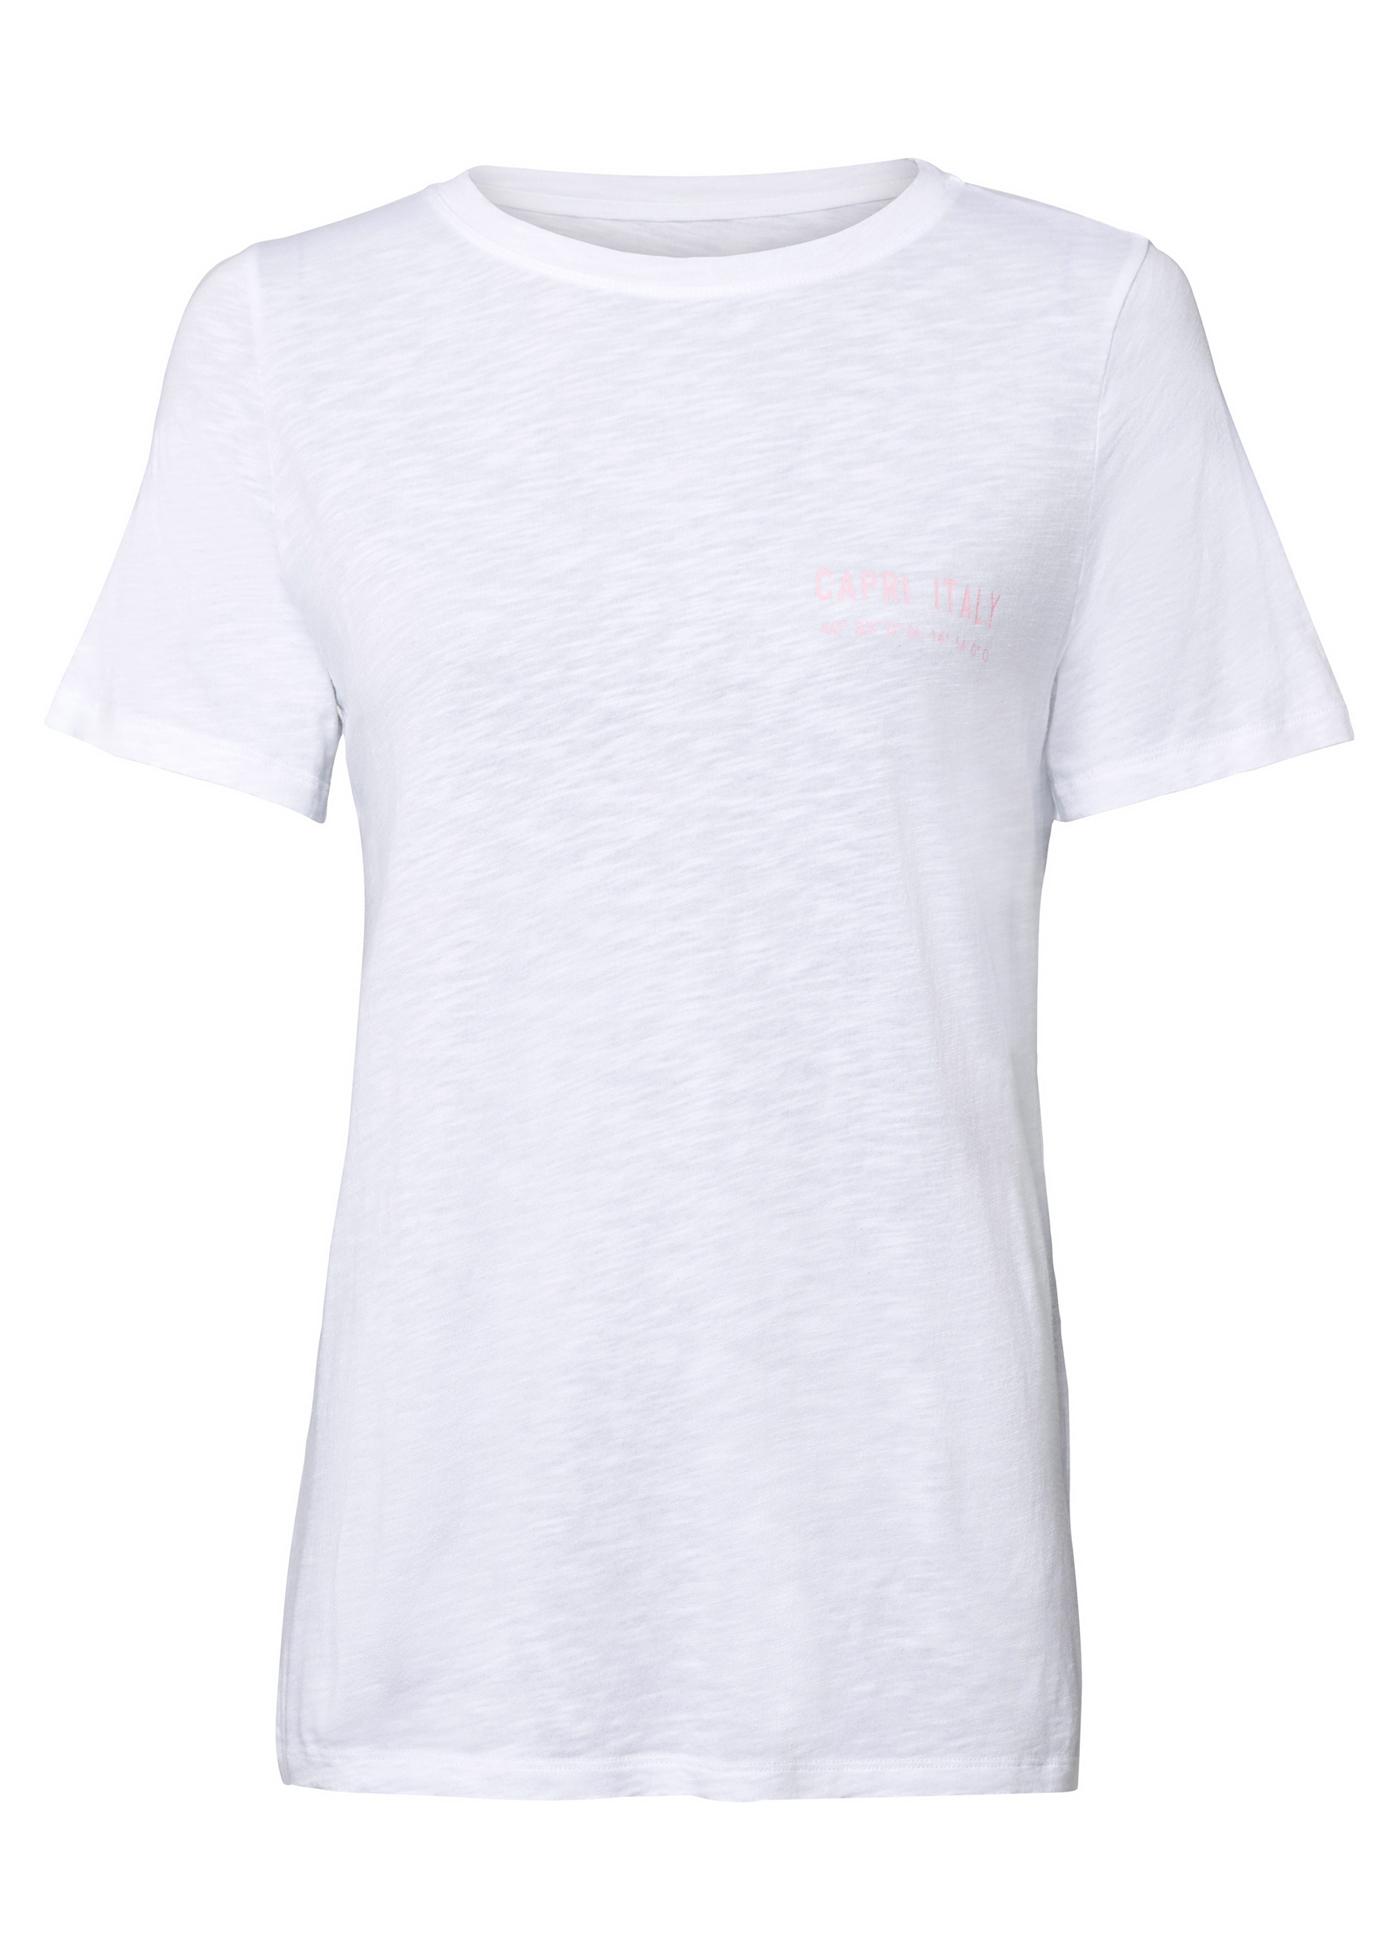 "CO Slub Shirt ""Capri image number 0"